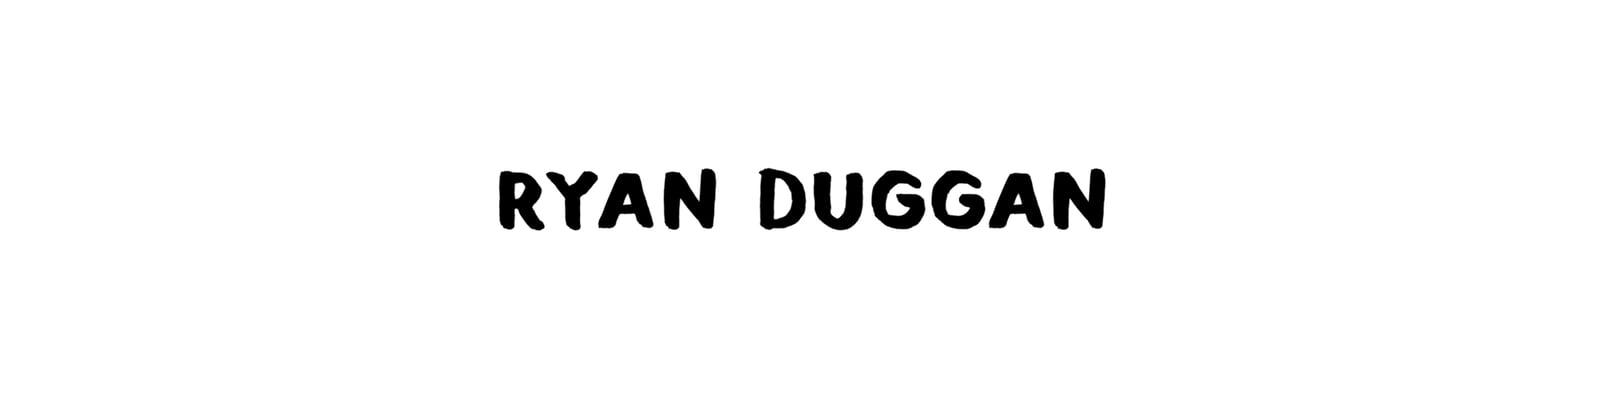 Ryan Duggan